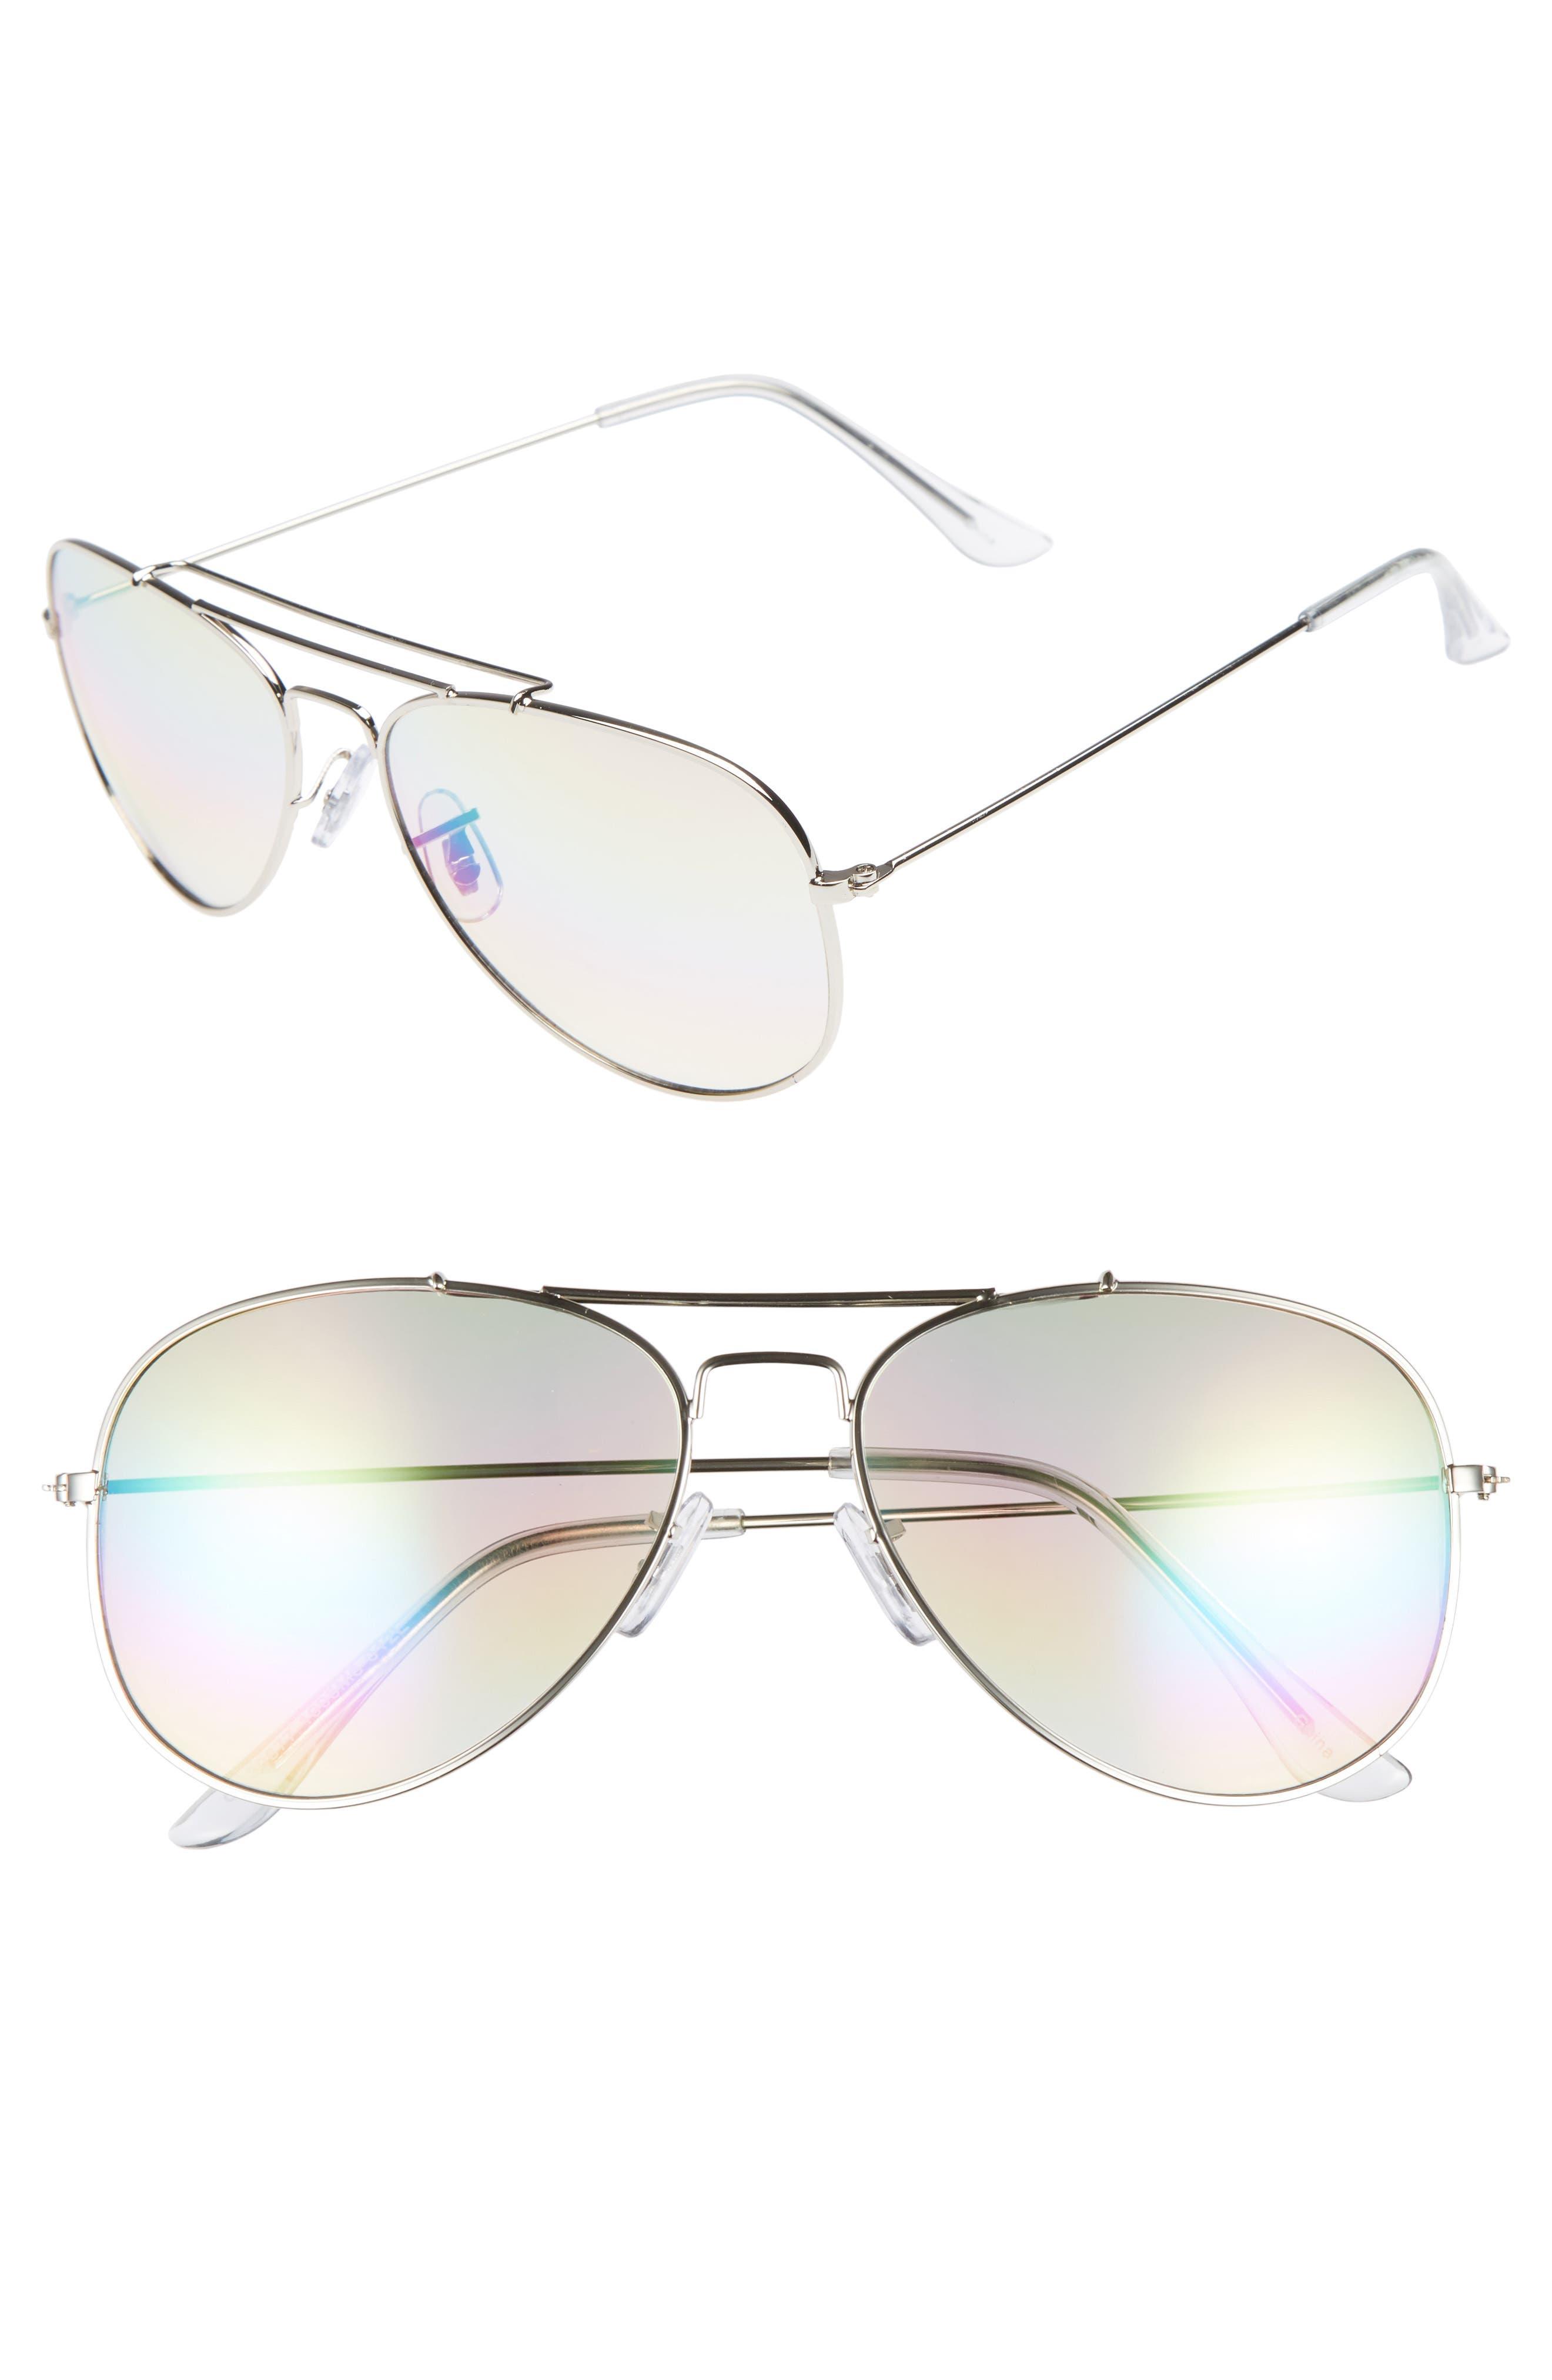 Rainbow Aviator Sunglasses,                         Main,                         color, 040